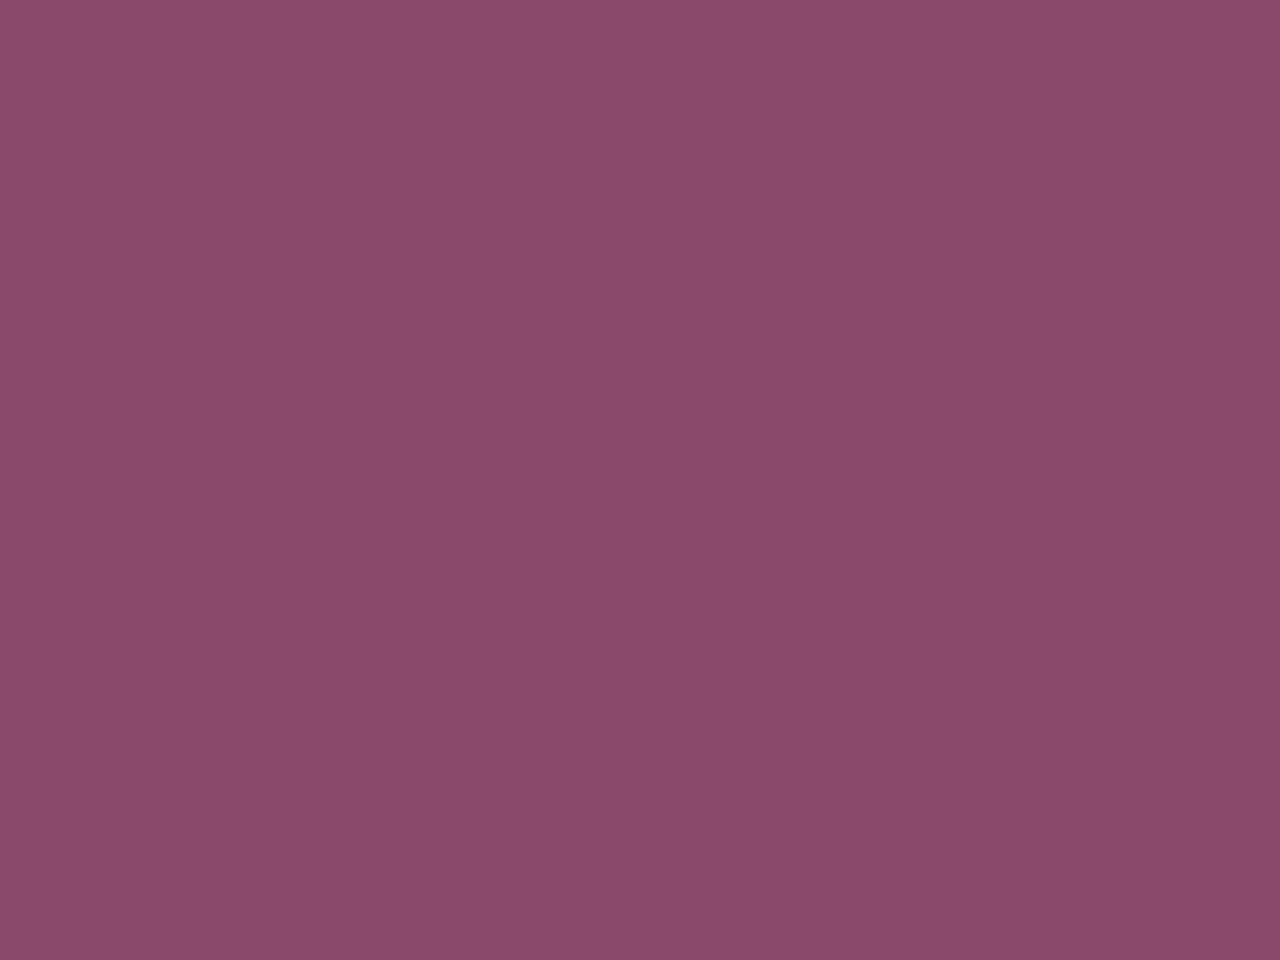 1280x960 Twilight Lavender Solid Color Background